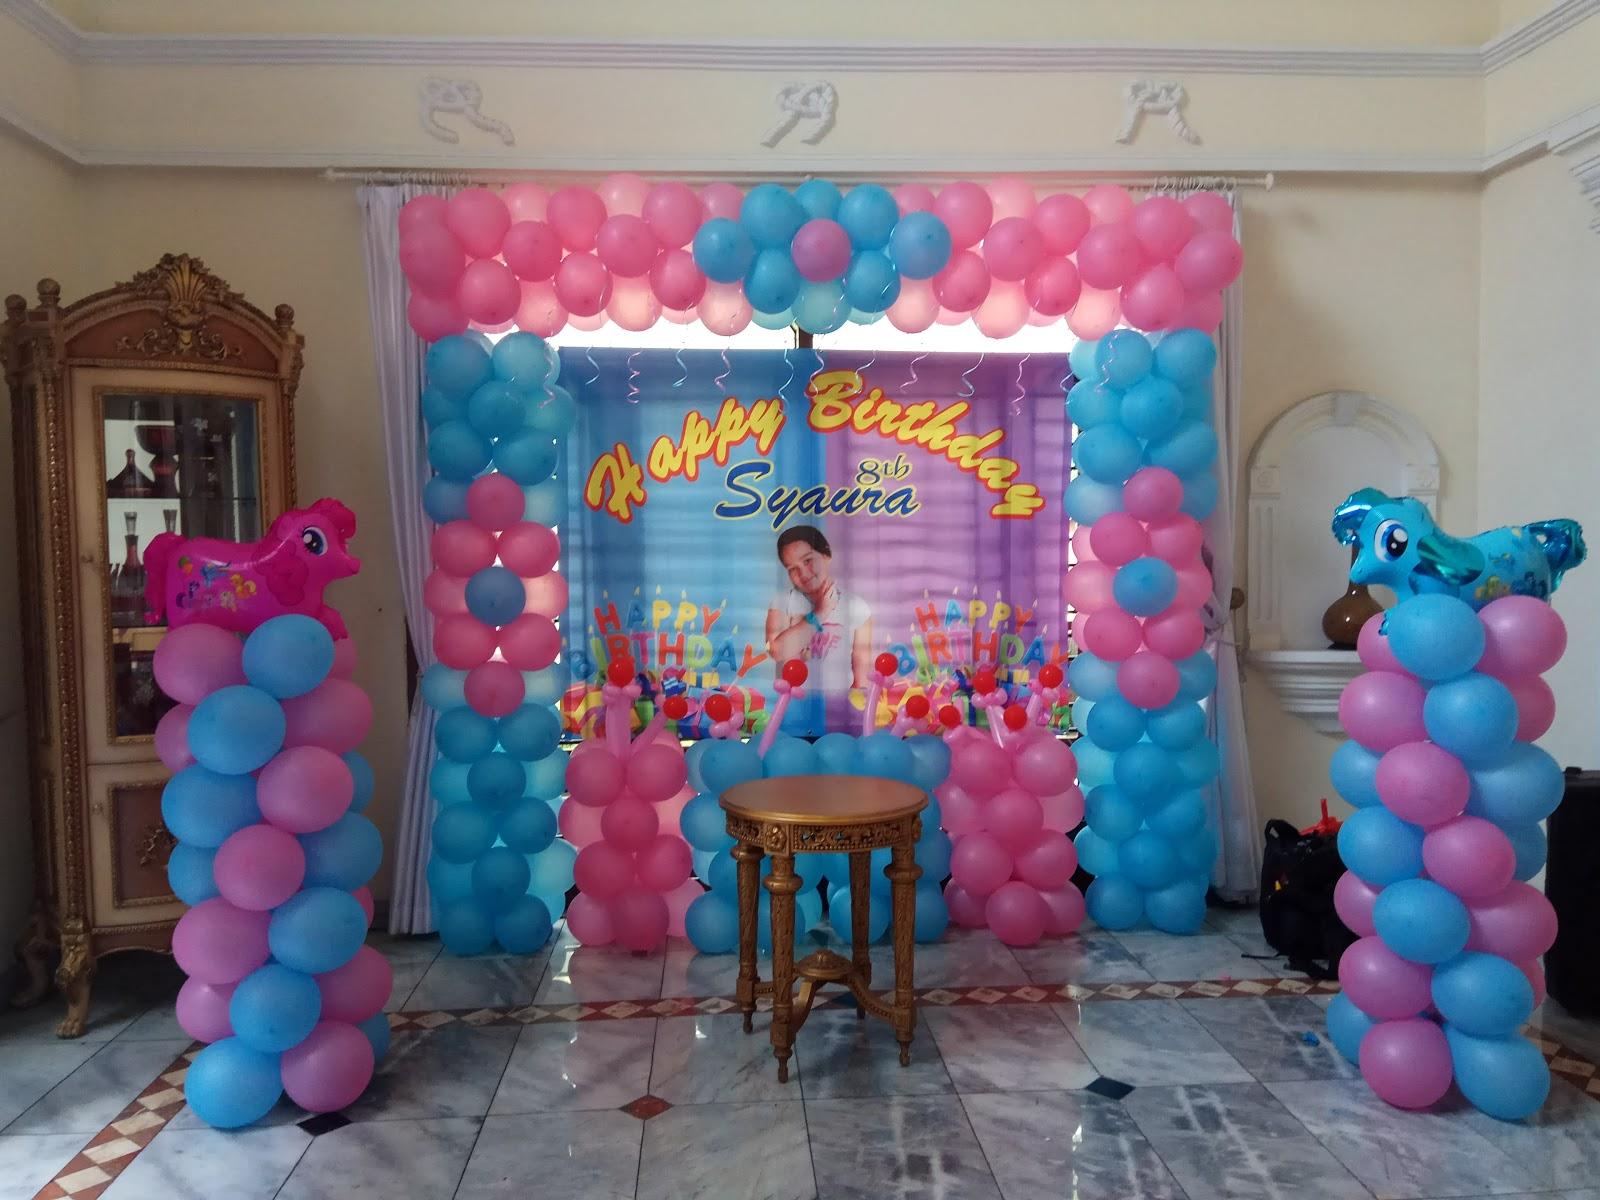 Dekorasi Balon Ultah Sederhana Ide Rumah Cantik